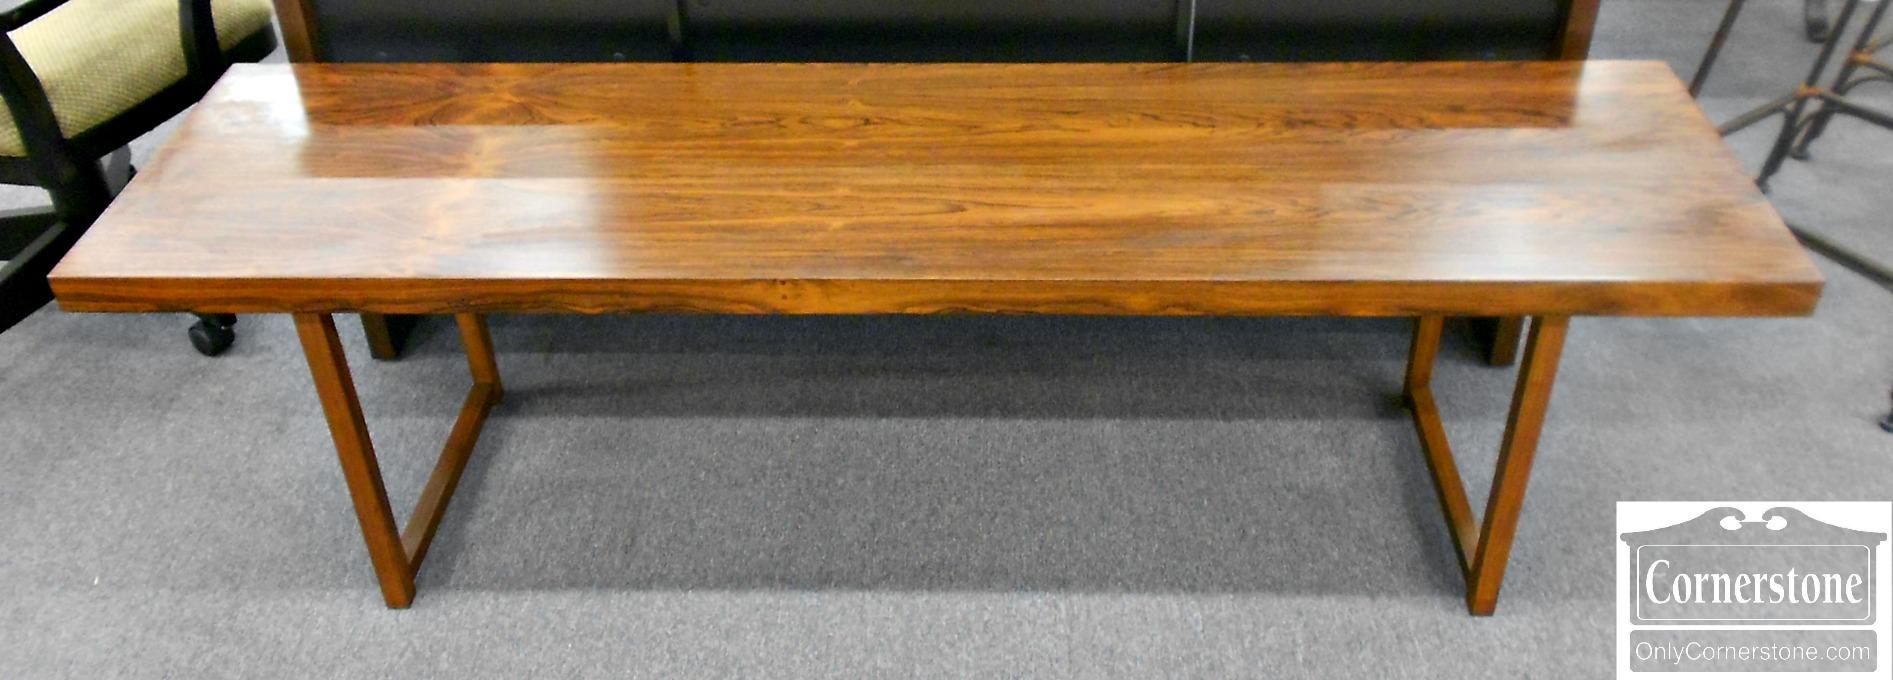 3959-879 Milo Baughman for Thayer Coggin Rosewood Mid Century Coffee Table